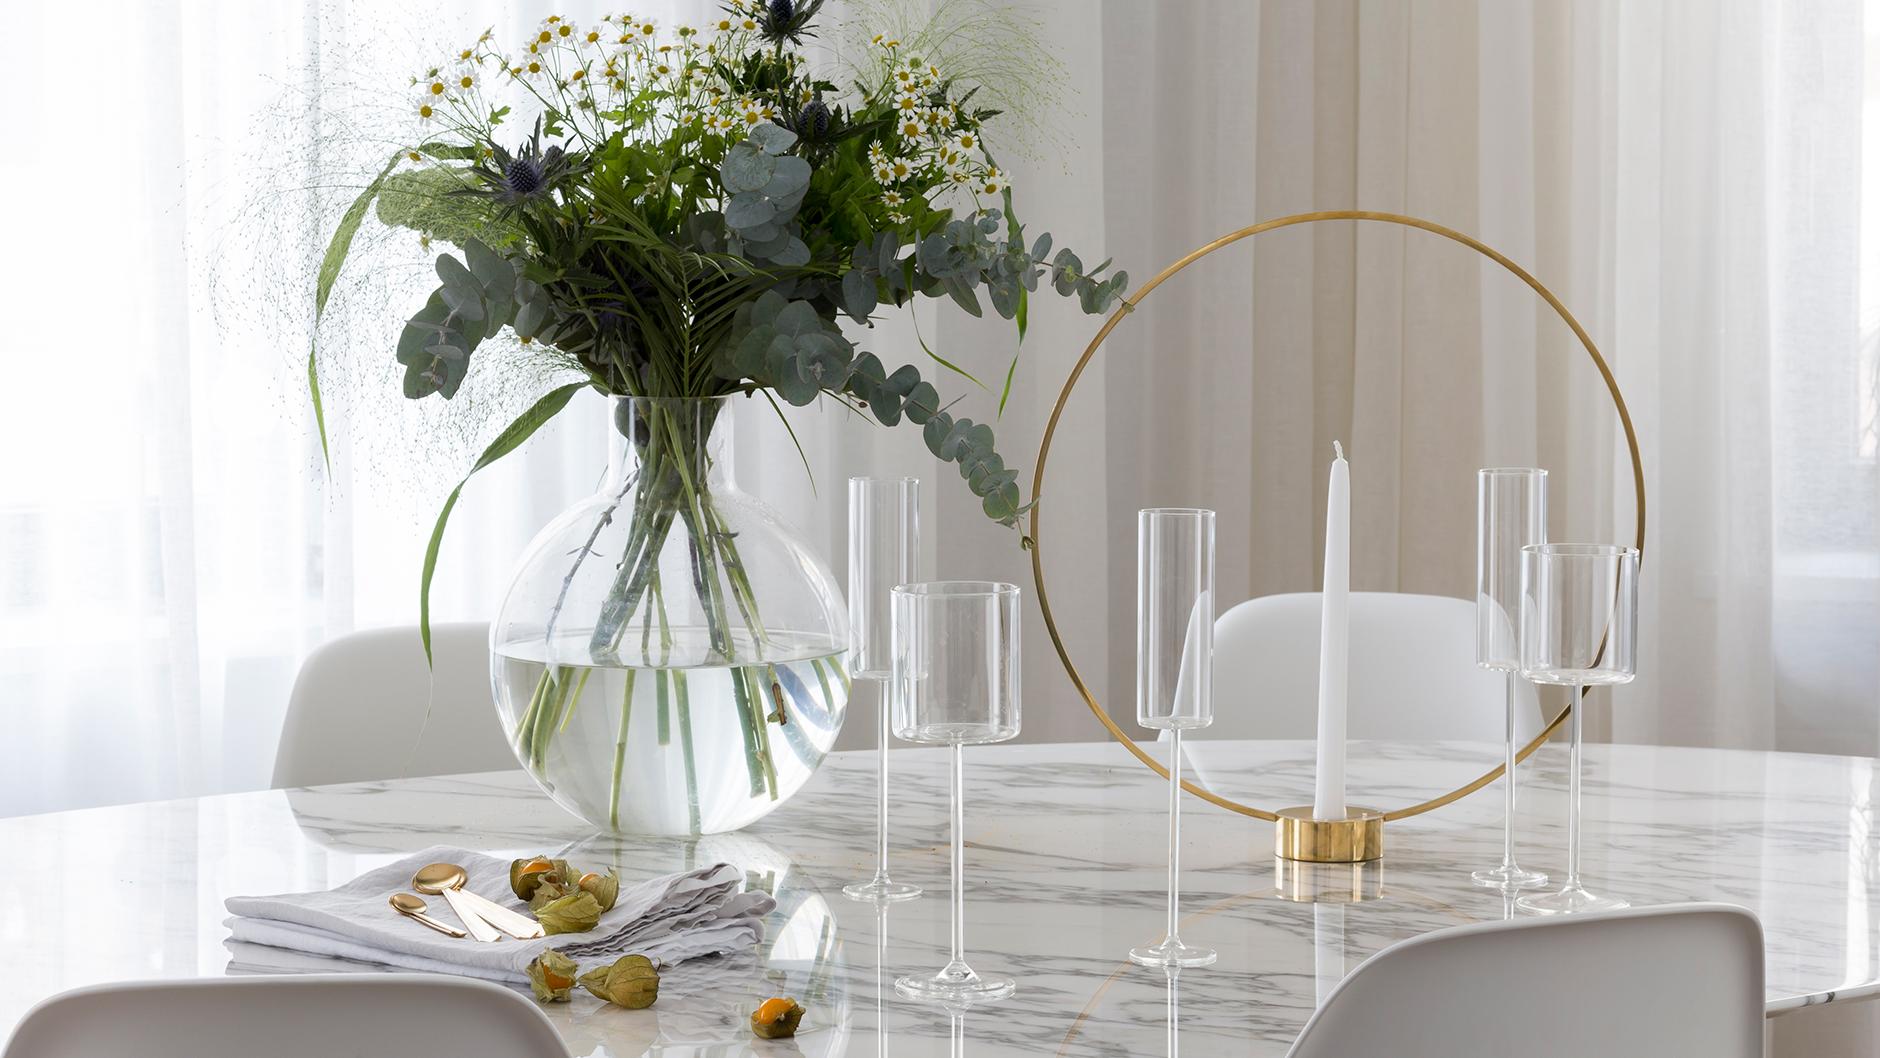 Interior Design Barts Square Askew Building Tableware